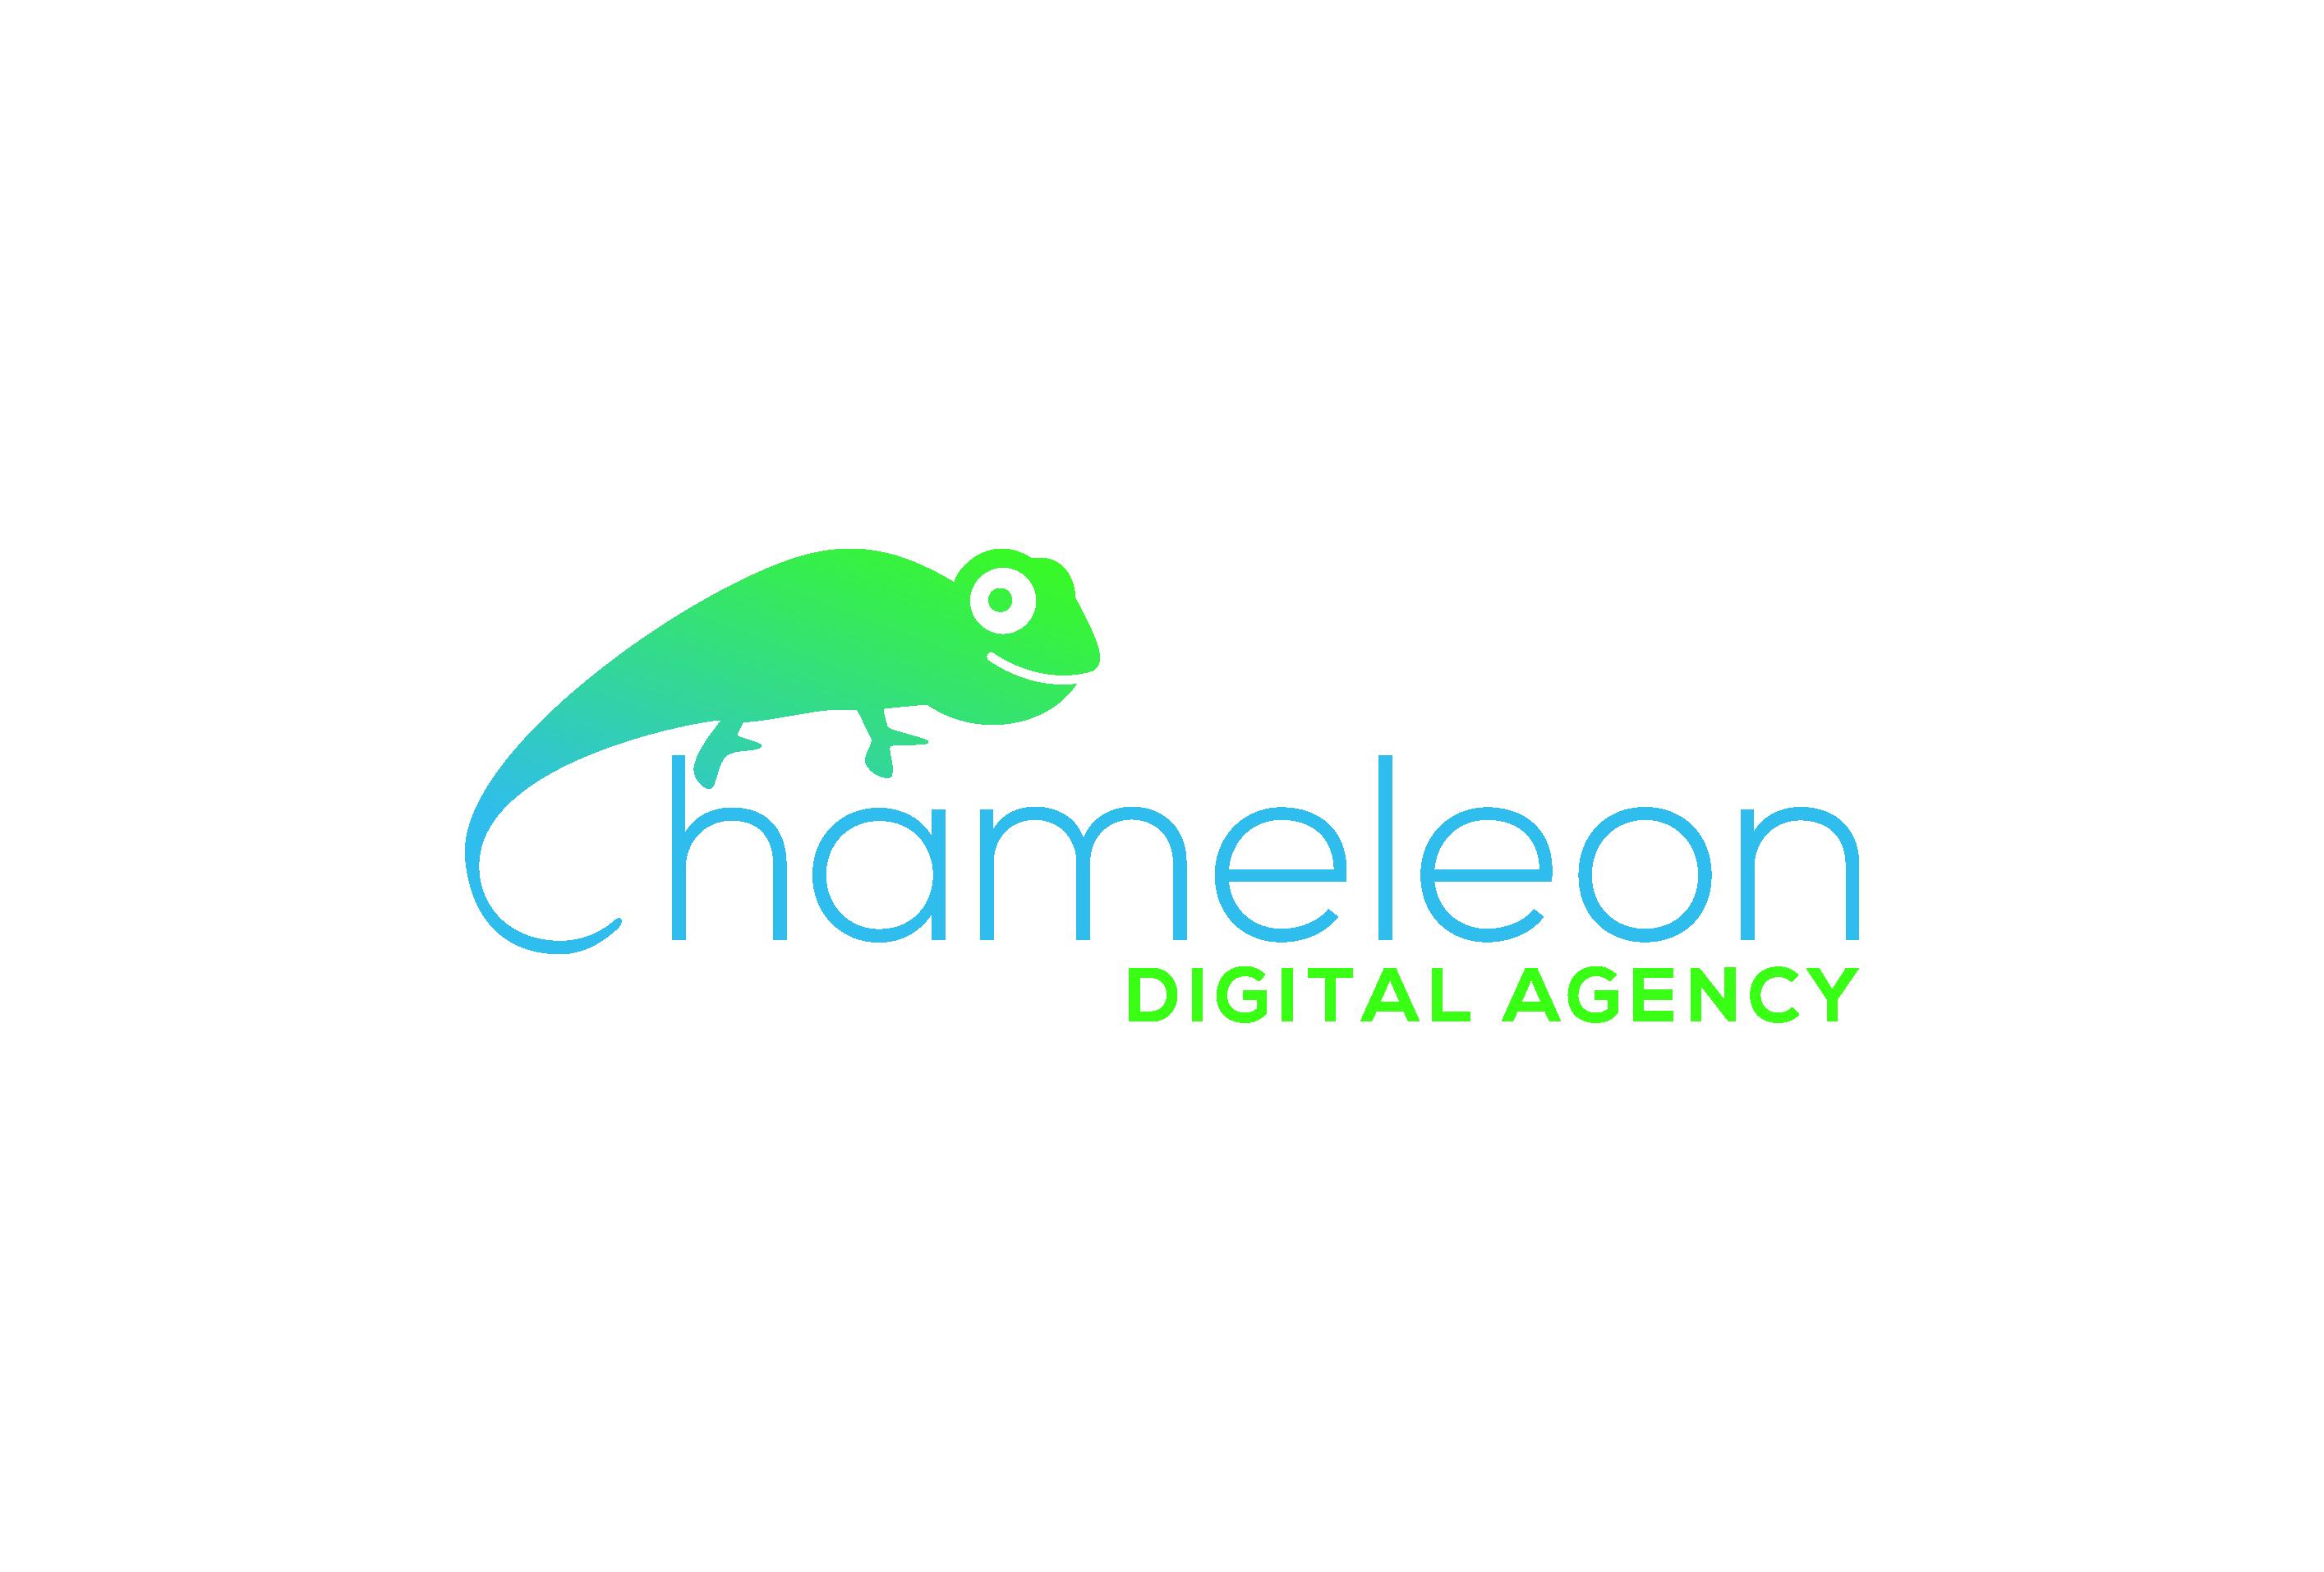 ChameleonDigital_Agency02